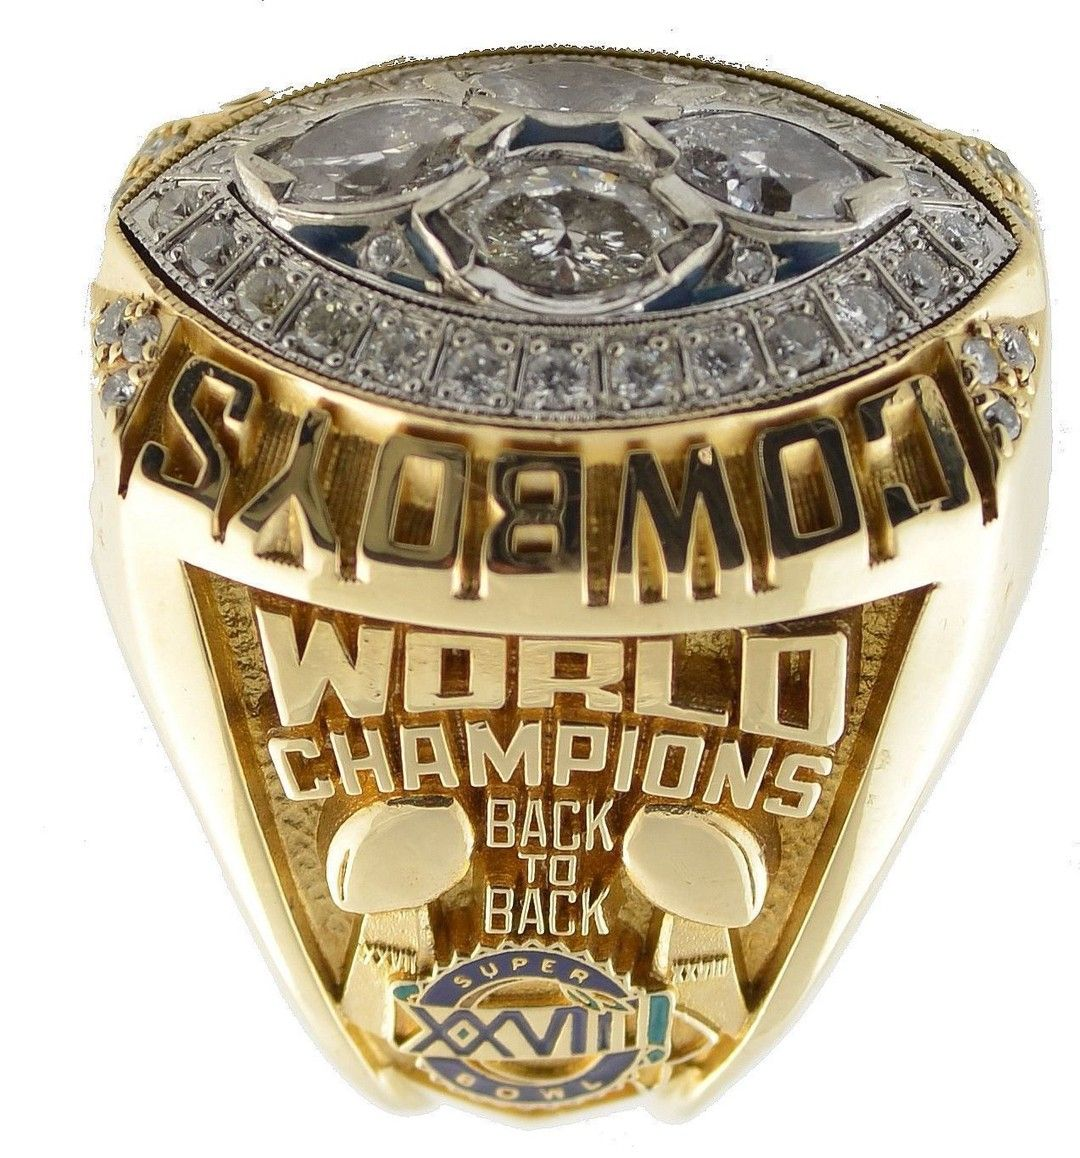 Dallas cowboys nfl super bowl championship ring for sale